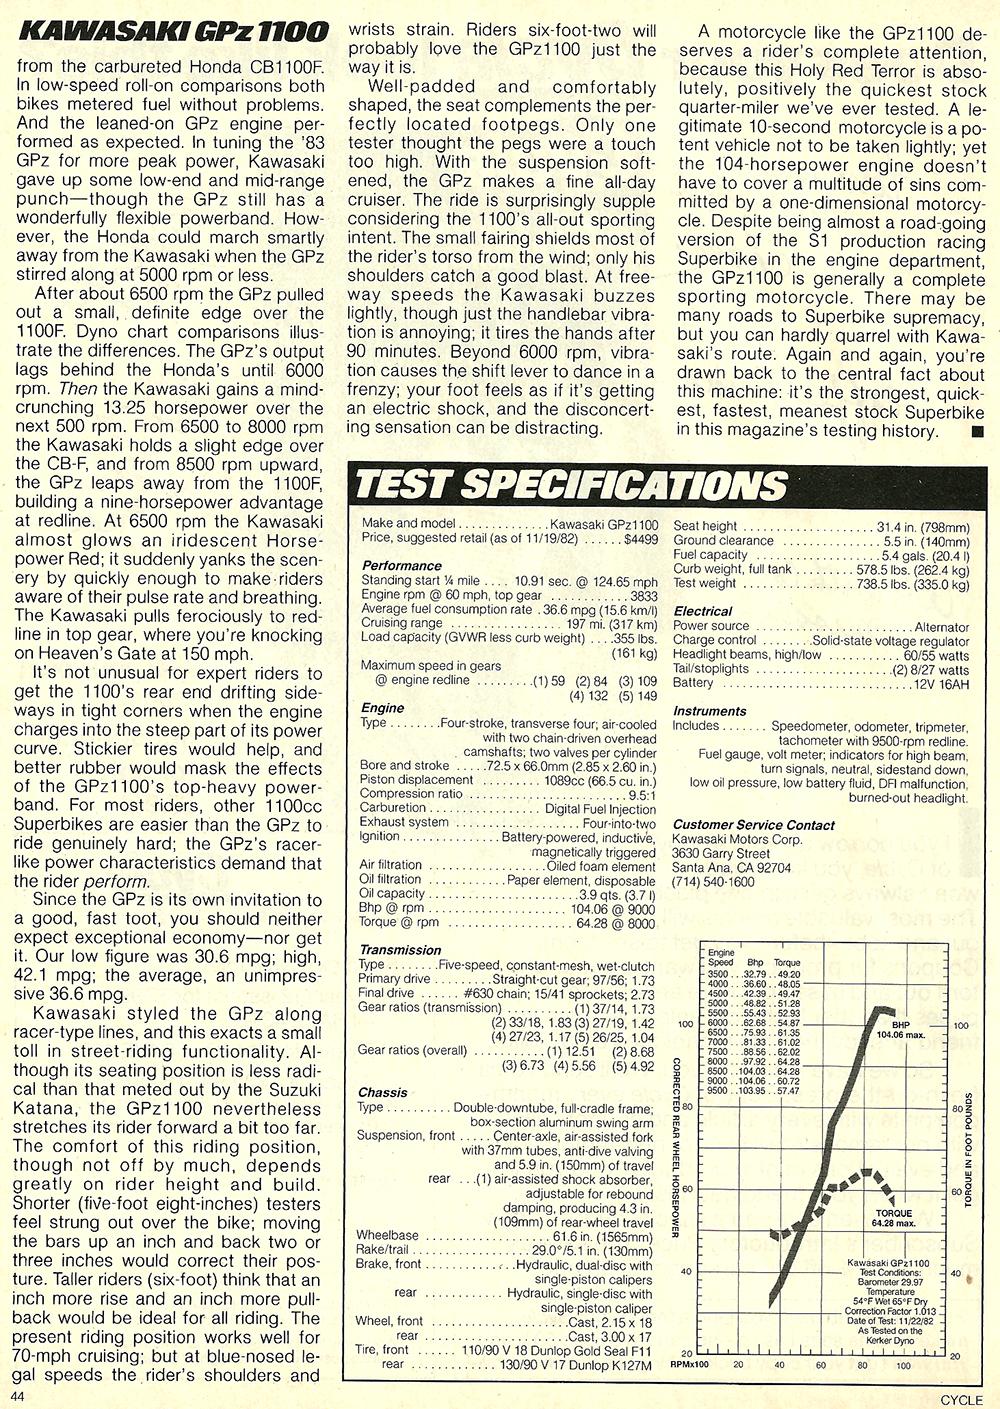 1983 Kawasaki GPz1100 road test 8.jpg